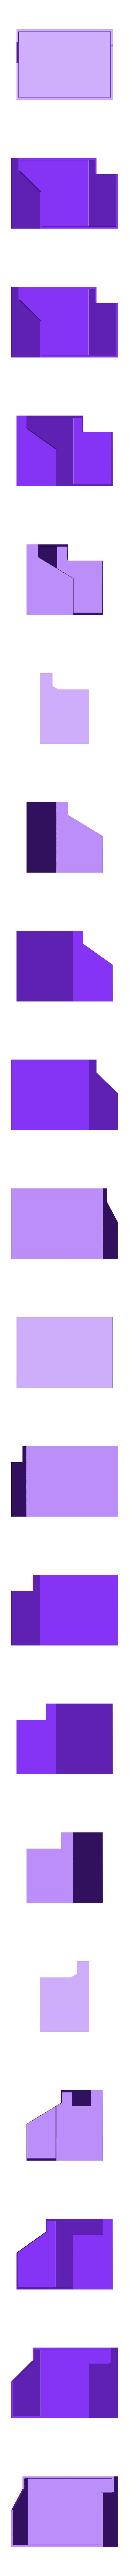 juki box.stl Download STL file Overlock Juki - box • 3D print template, LukeZ